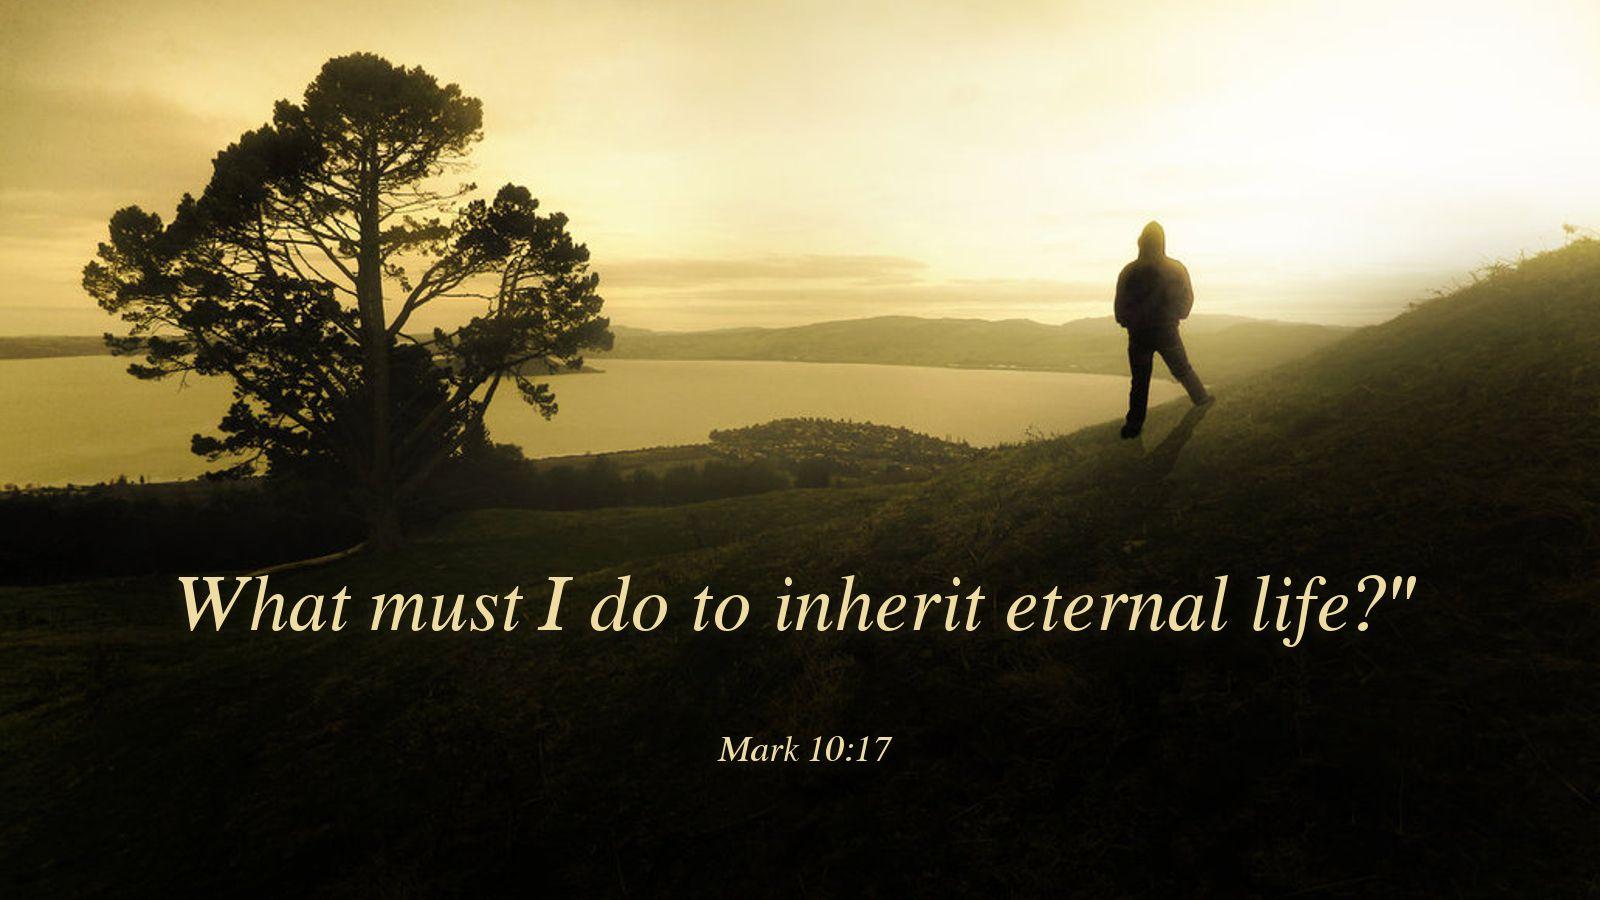 Hasil gambar untuk mark 10:17